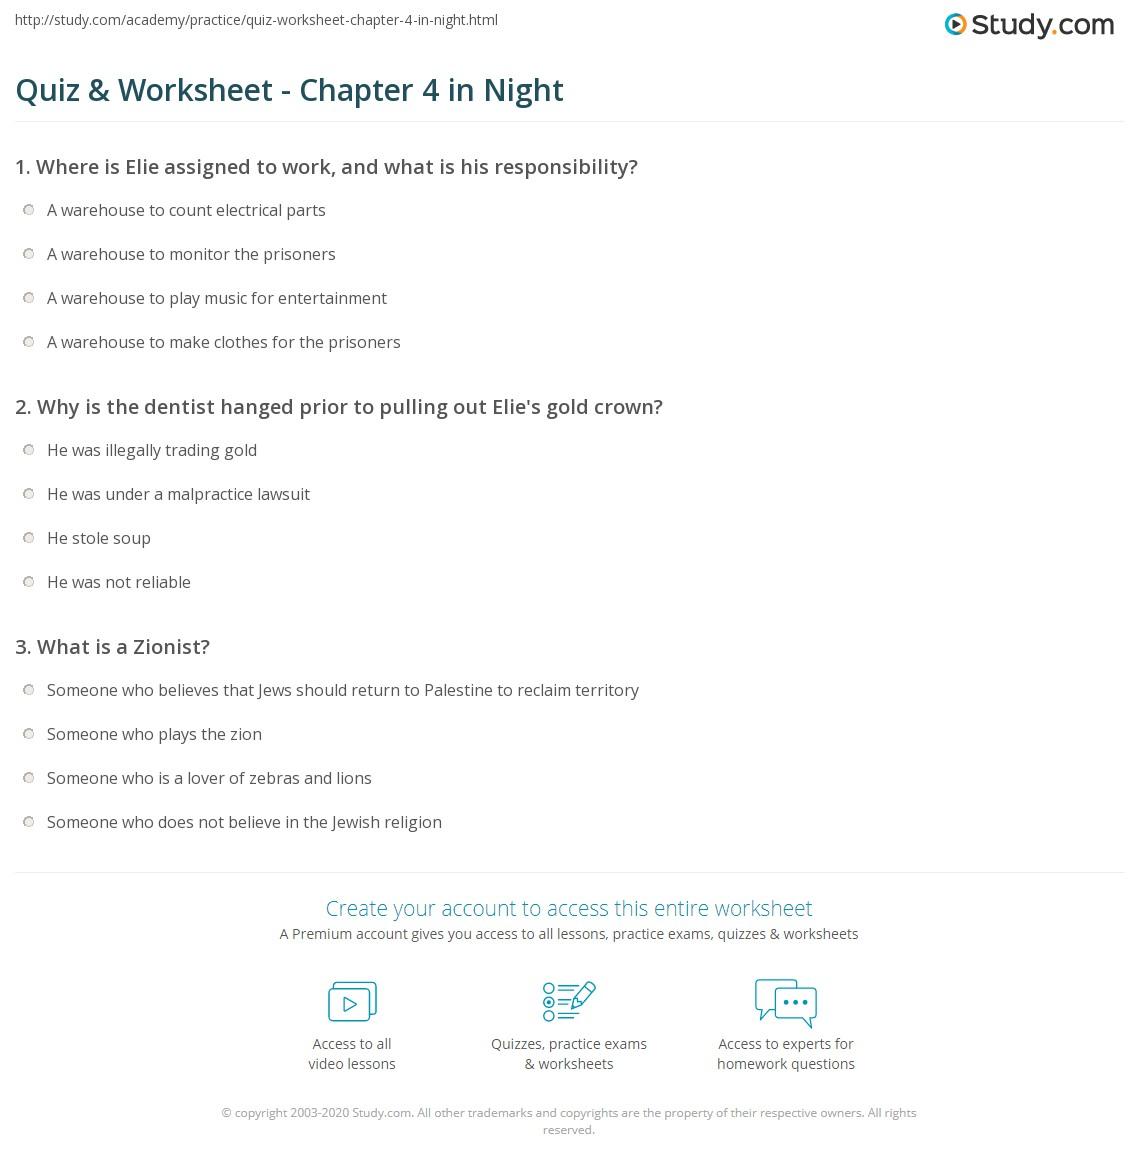 Answers To Night Worksheet - ora-exacta.co